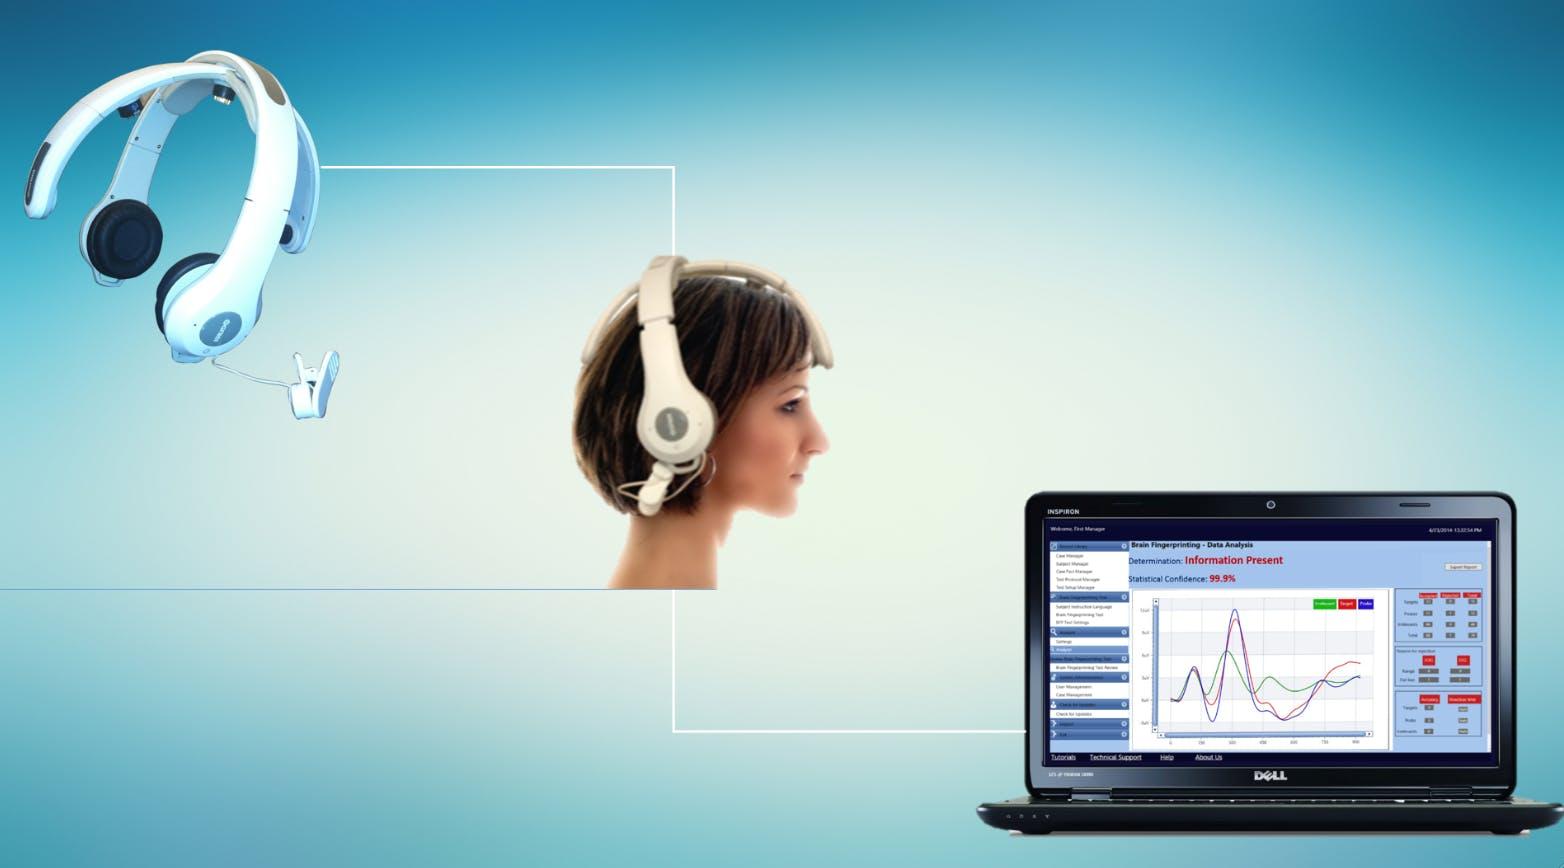 Brainwave Science's brain fingerprinting headset